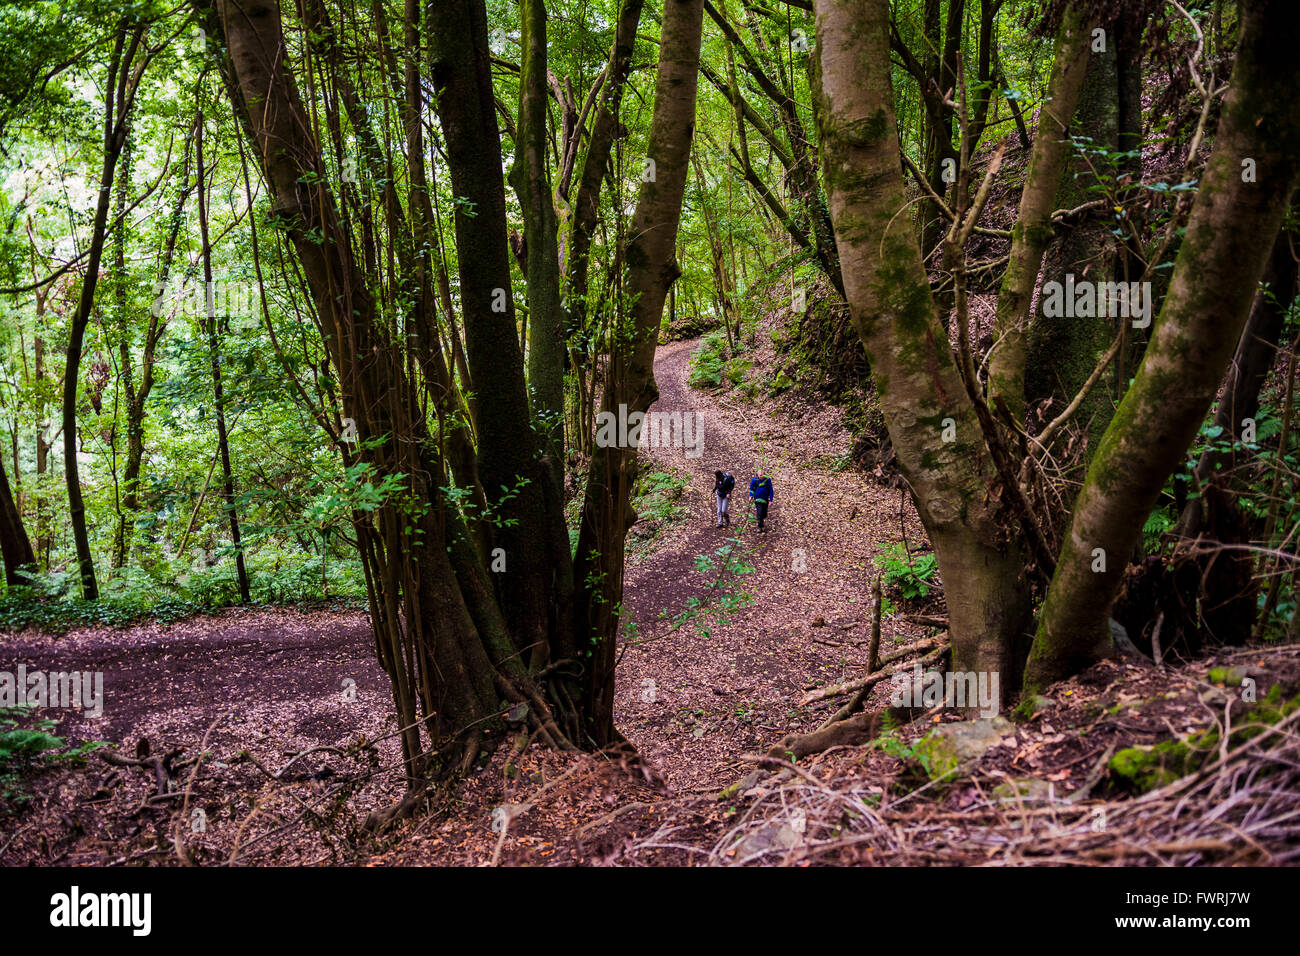 Wanderweg im Laurissilva-Wald. Los Tilos. San Andrés y Sauces, La Palma, Teneriffa, Kanarische Inseln, Spanien Stockbild